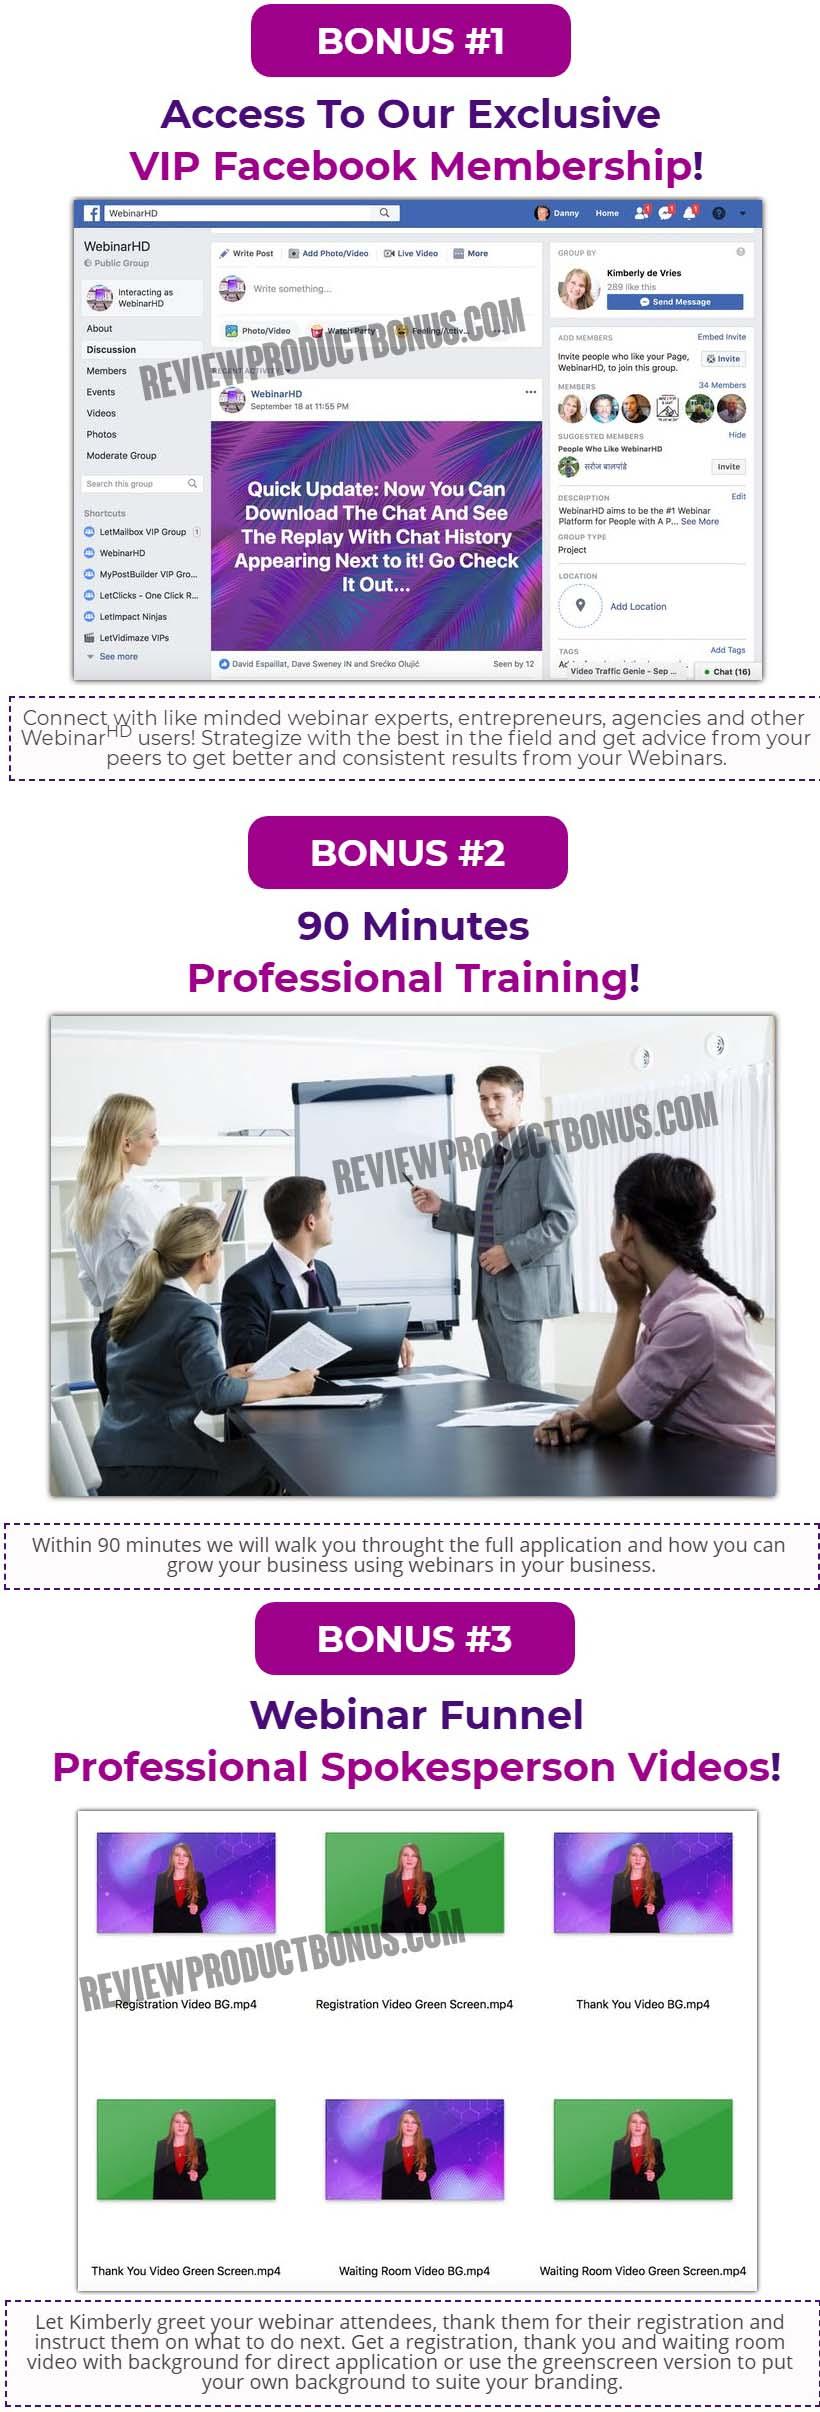 WebinarsHD Bonuses